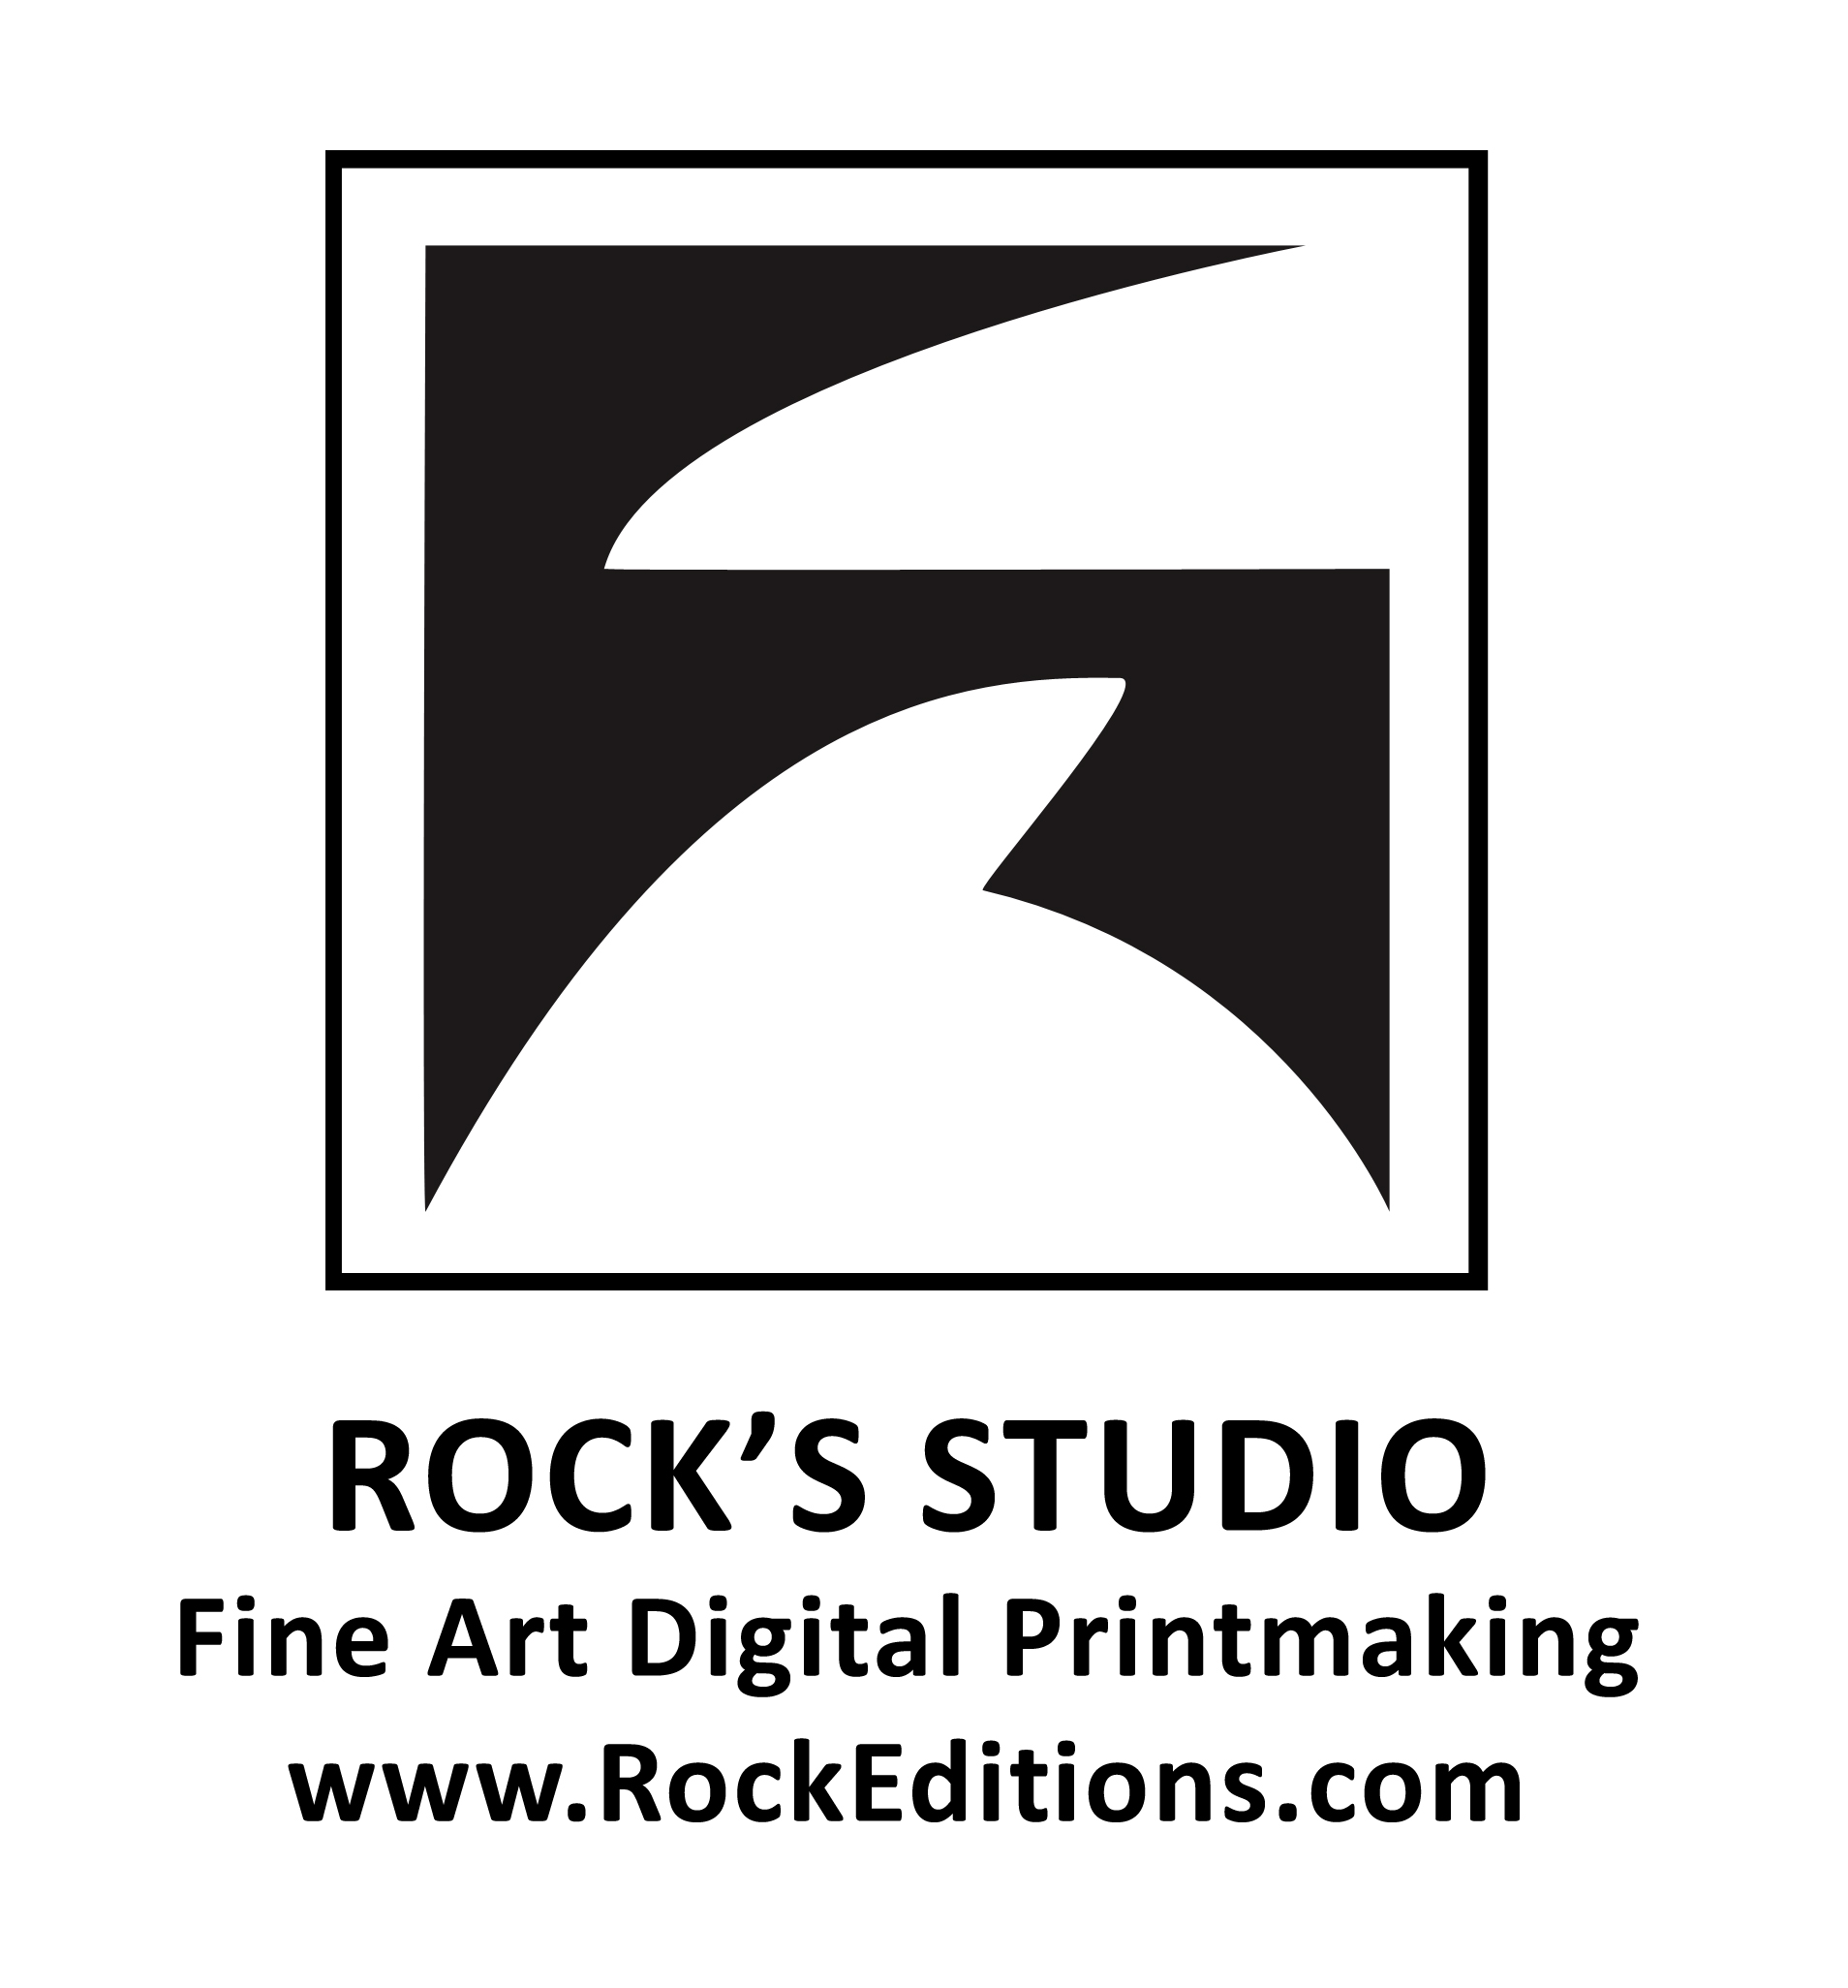 02.Rock Studio Logo.jpg